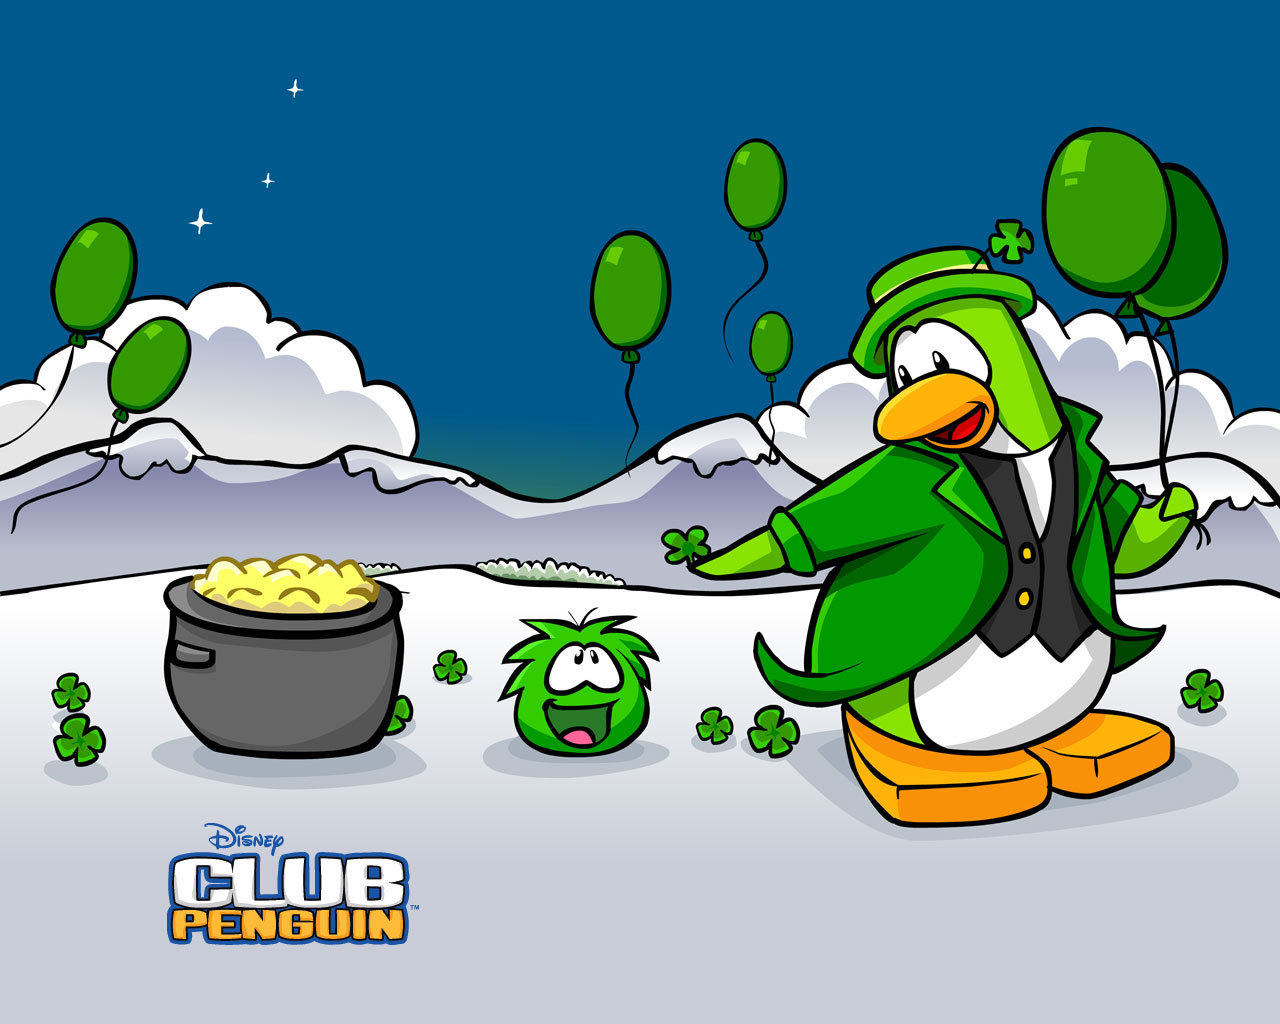 http://4.bp.blogspot.com/-F6TYO7bI8Vo/TlRBZ43yIVI/AAAAAAAAAH0/Ao1viCUAEbk/s1600/Wallpapers-club-penguin-4664395-1280-1024.jpg